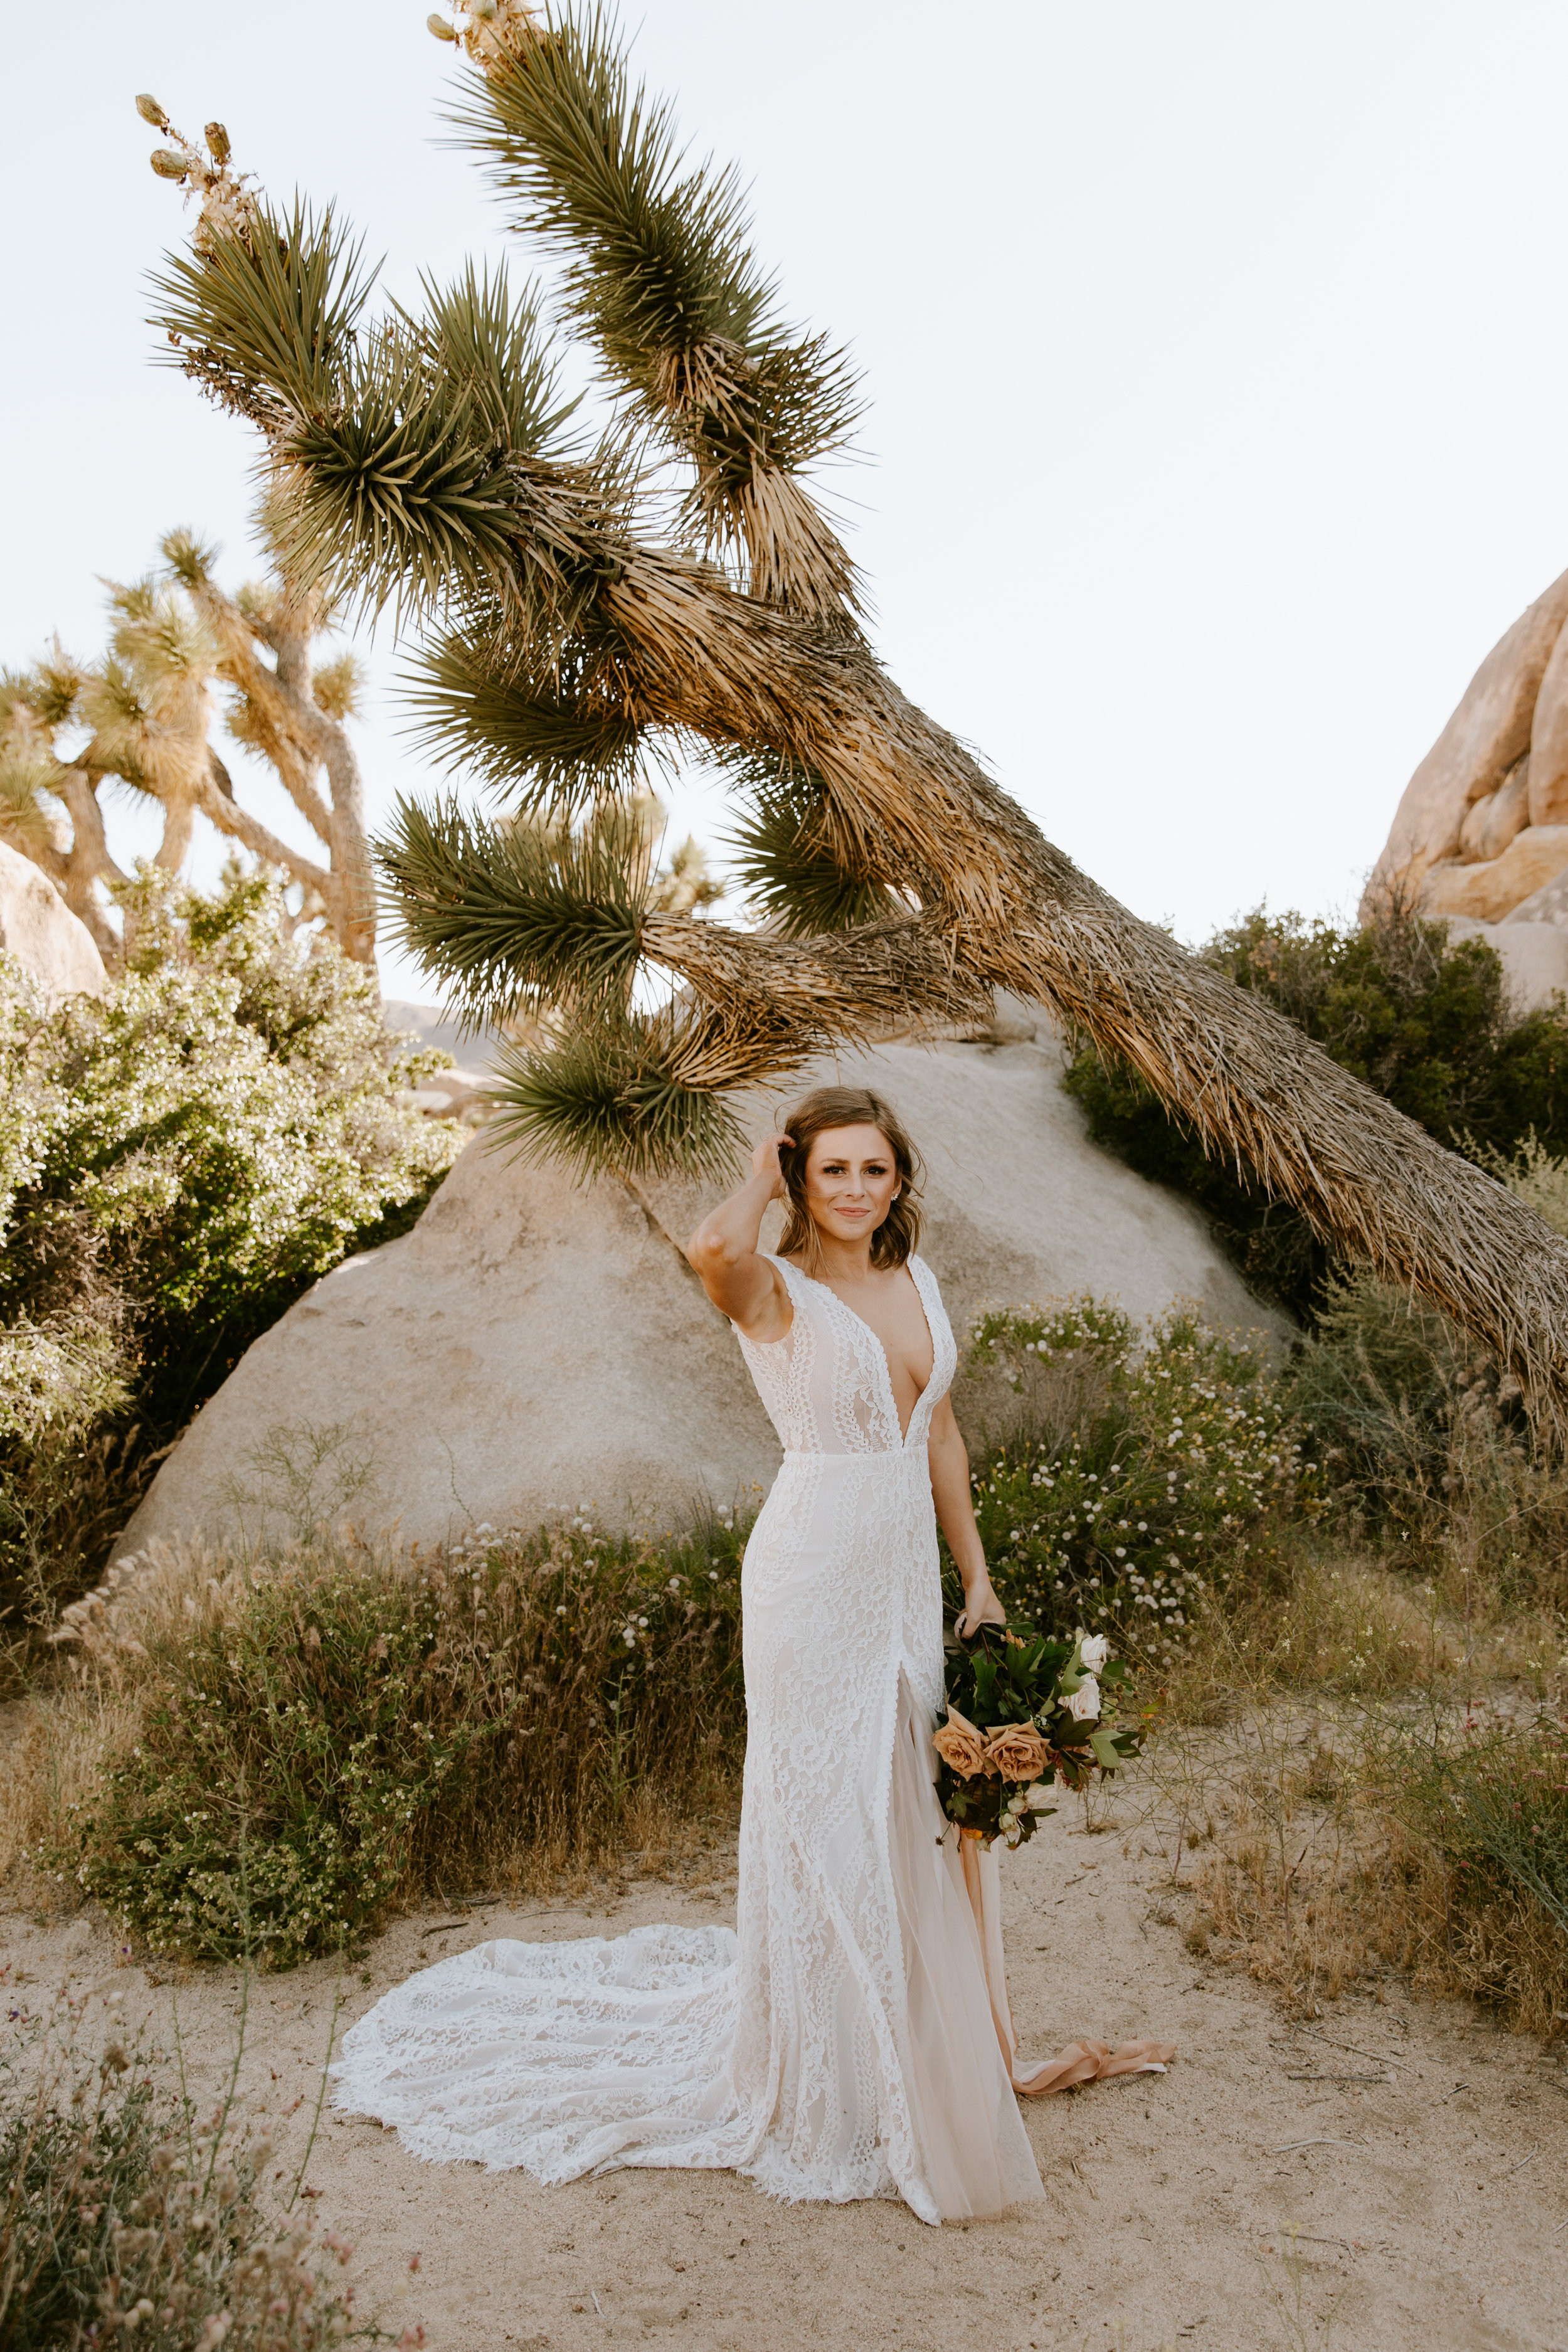 2019-05-26_Callie-Evan_Wedding_Joshua Tree_Paige Nelson_PREVIEWS HR-36.jpg